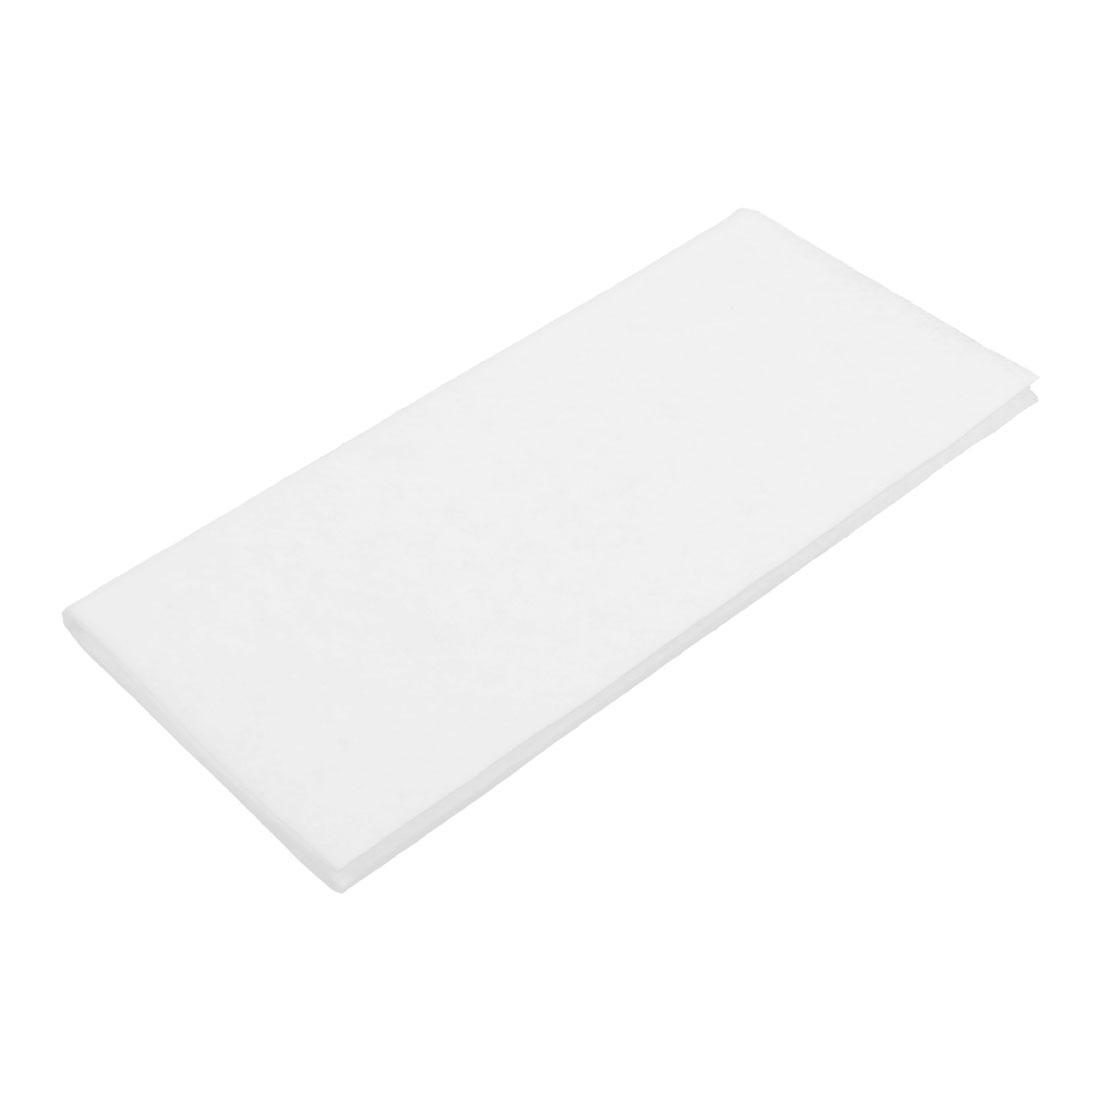 Kitchen Smoke Exhaust Bio Sponge Filter Media Pad Foam Cotton Sponge Pad Mat